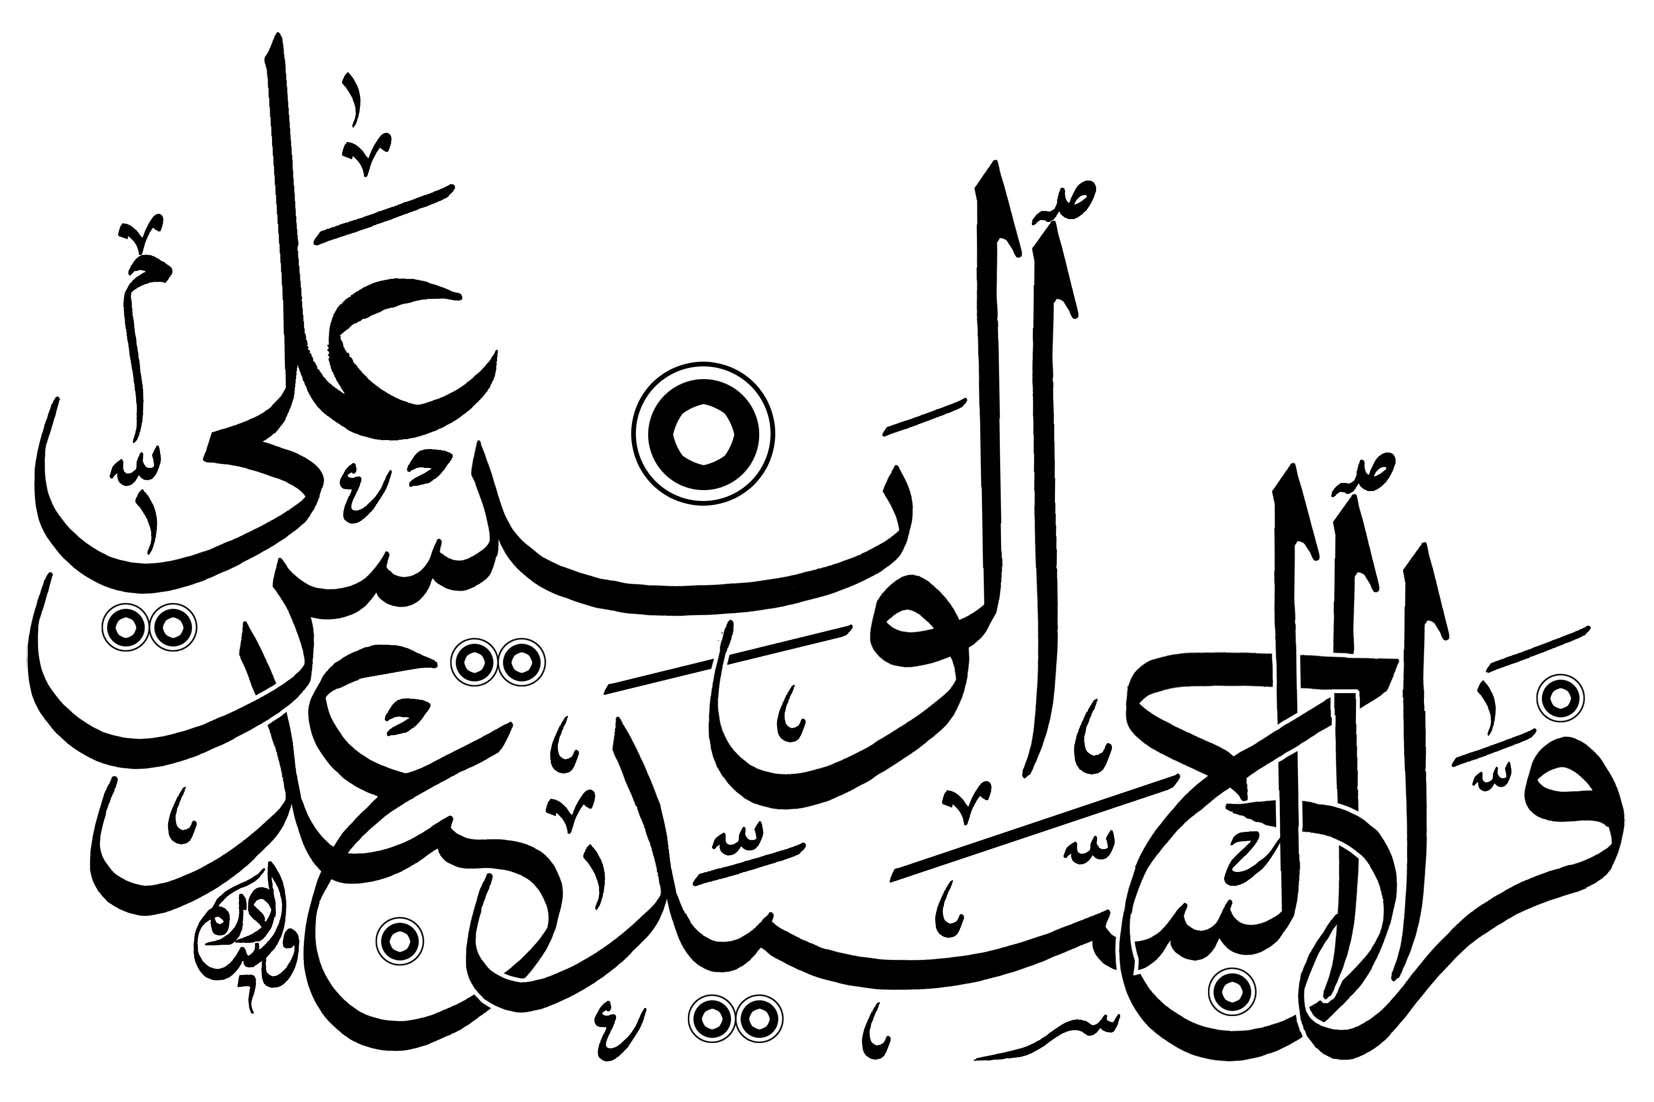 Calligraphy Handwriting فراج السيد عبد الونيس علي تركيبة خط الثلث زخرفة للتنقيط Arabic Calligraphy Calligraphy Art